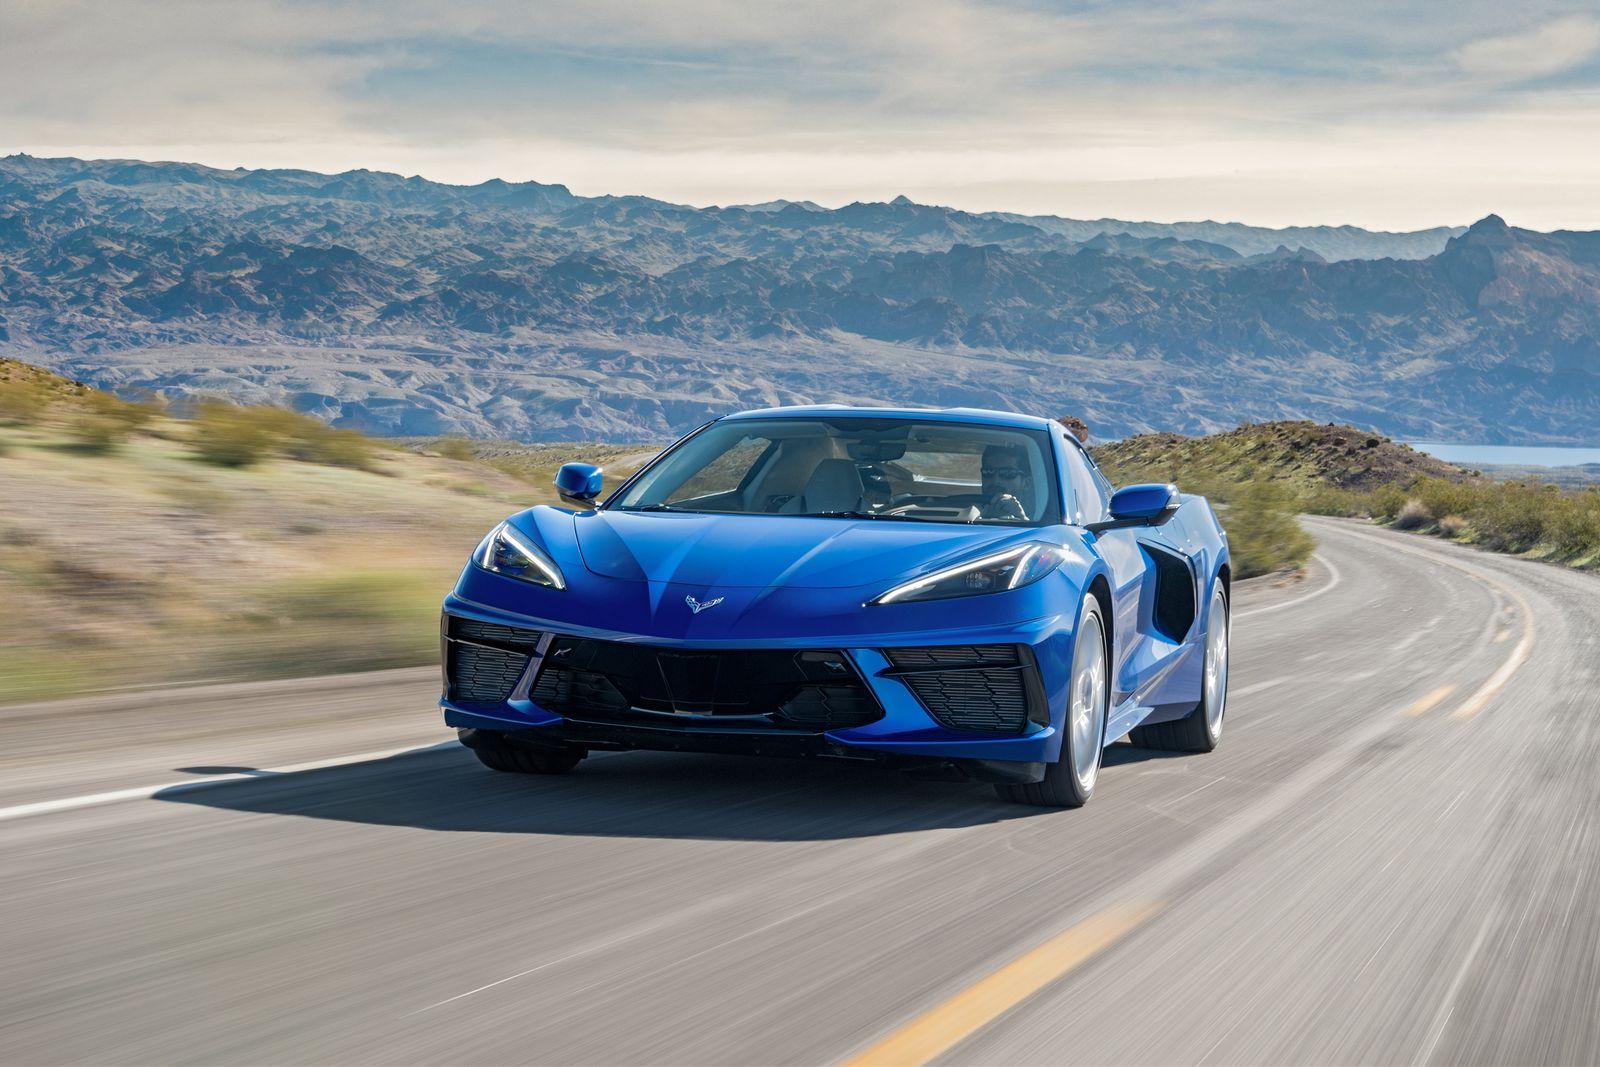 2020-Corvette-D55_7097